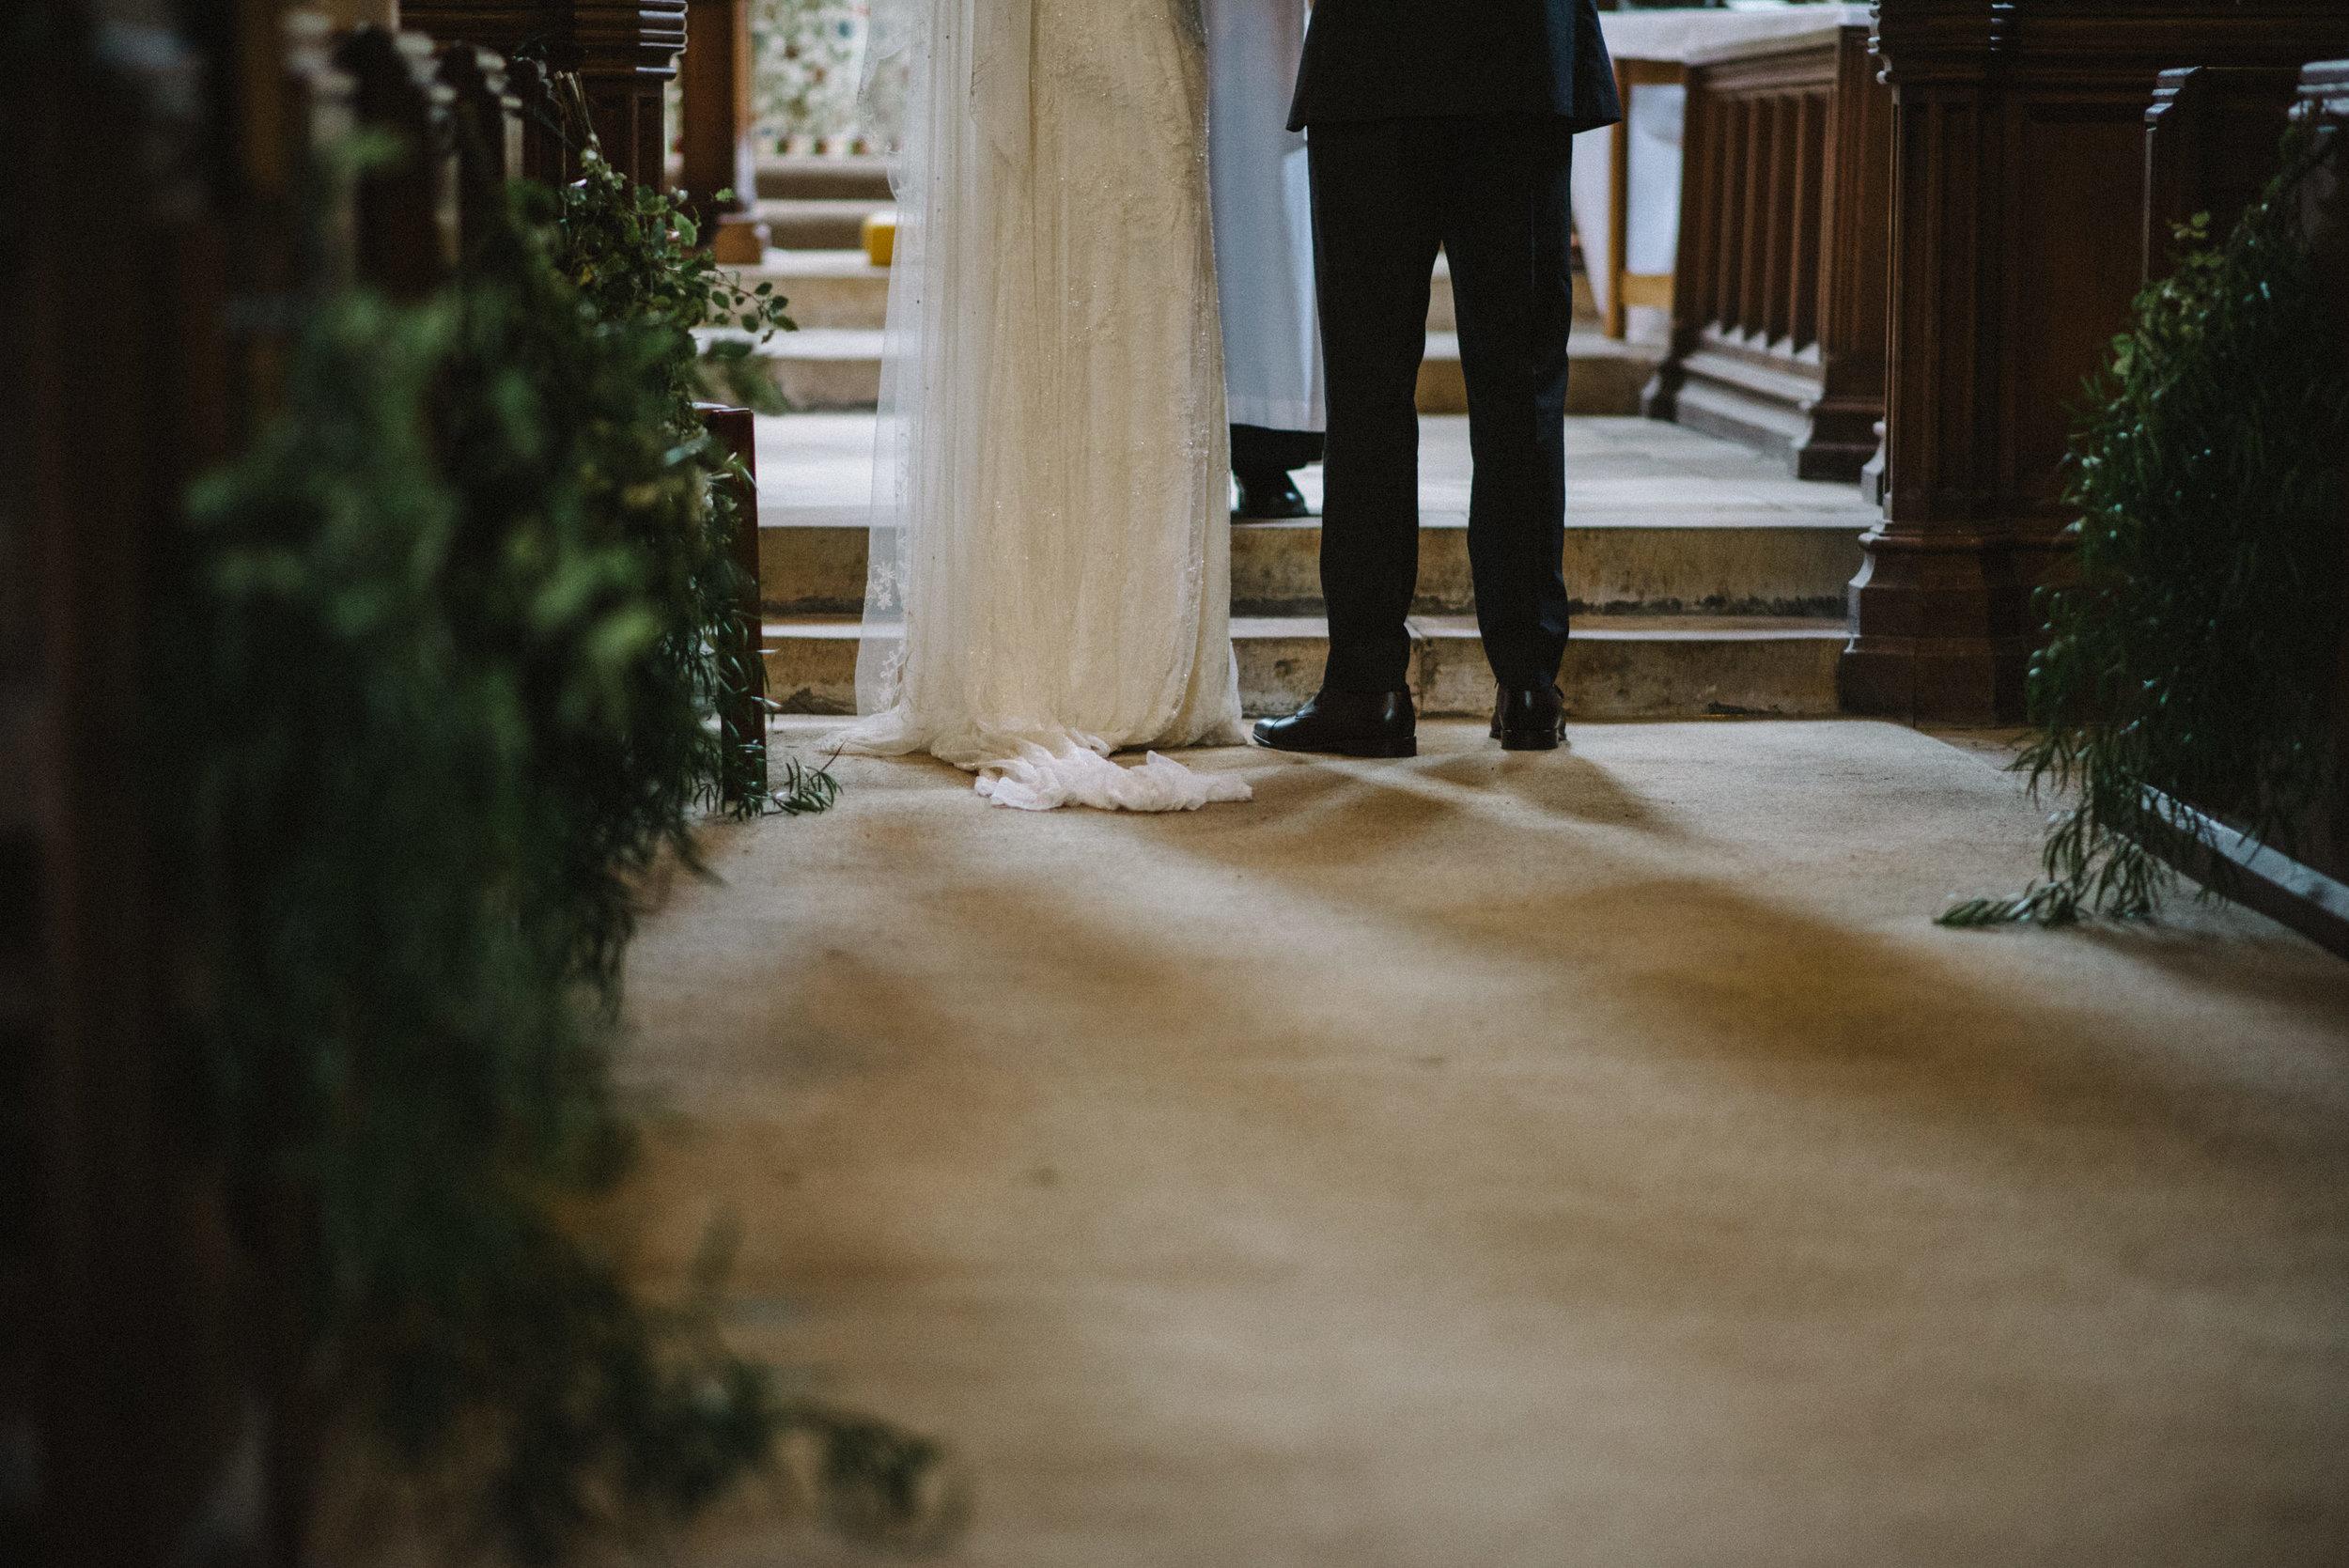 0076-LISA-DEVINE-PHOTOGRAPHY-ALTERNATIVE-WEDDING-PHOTOGRAPHY-SCOTLAND-DESTINATION-WEDDINGS-GLASGOW-WEDDINGS-COOL-WEDDINGS-STYLISH-WEDDINGS.JPG